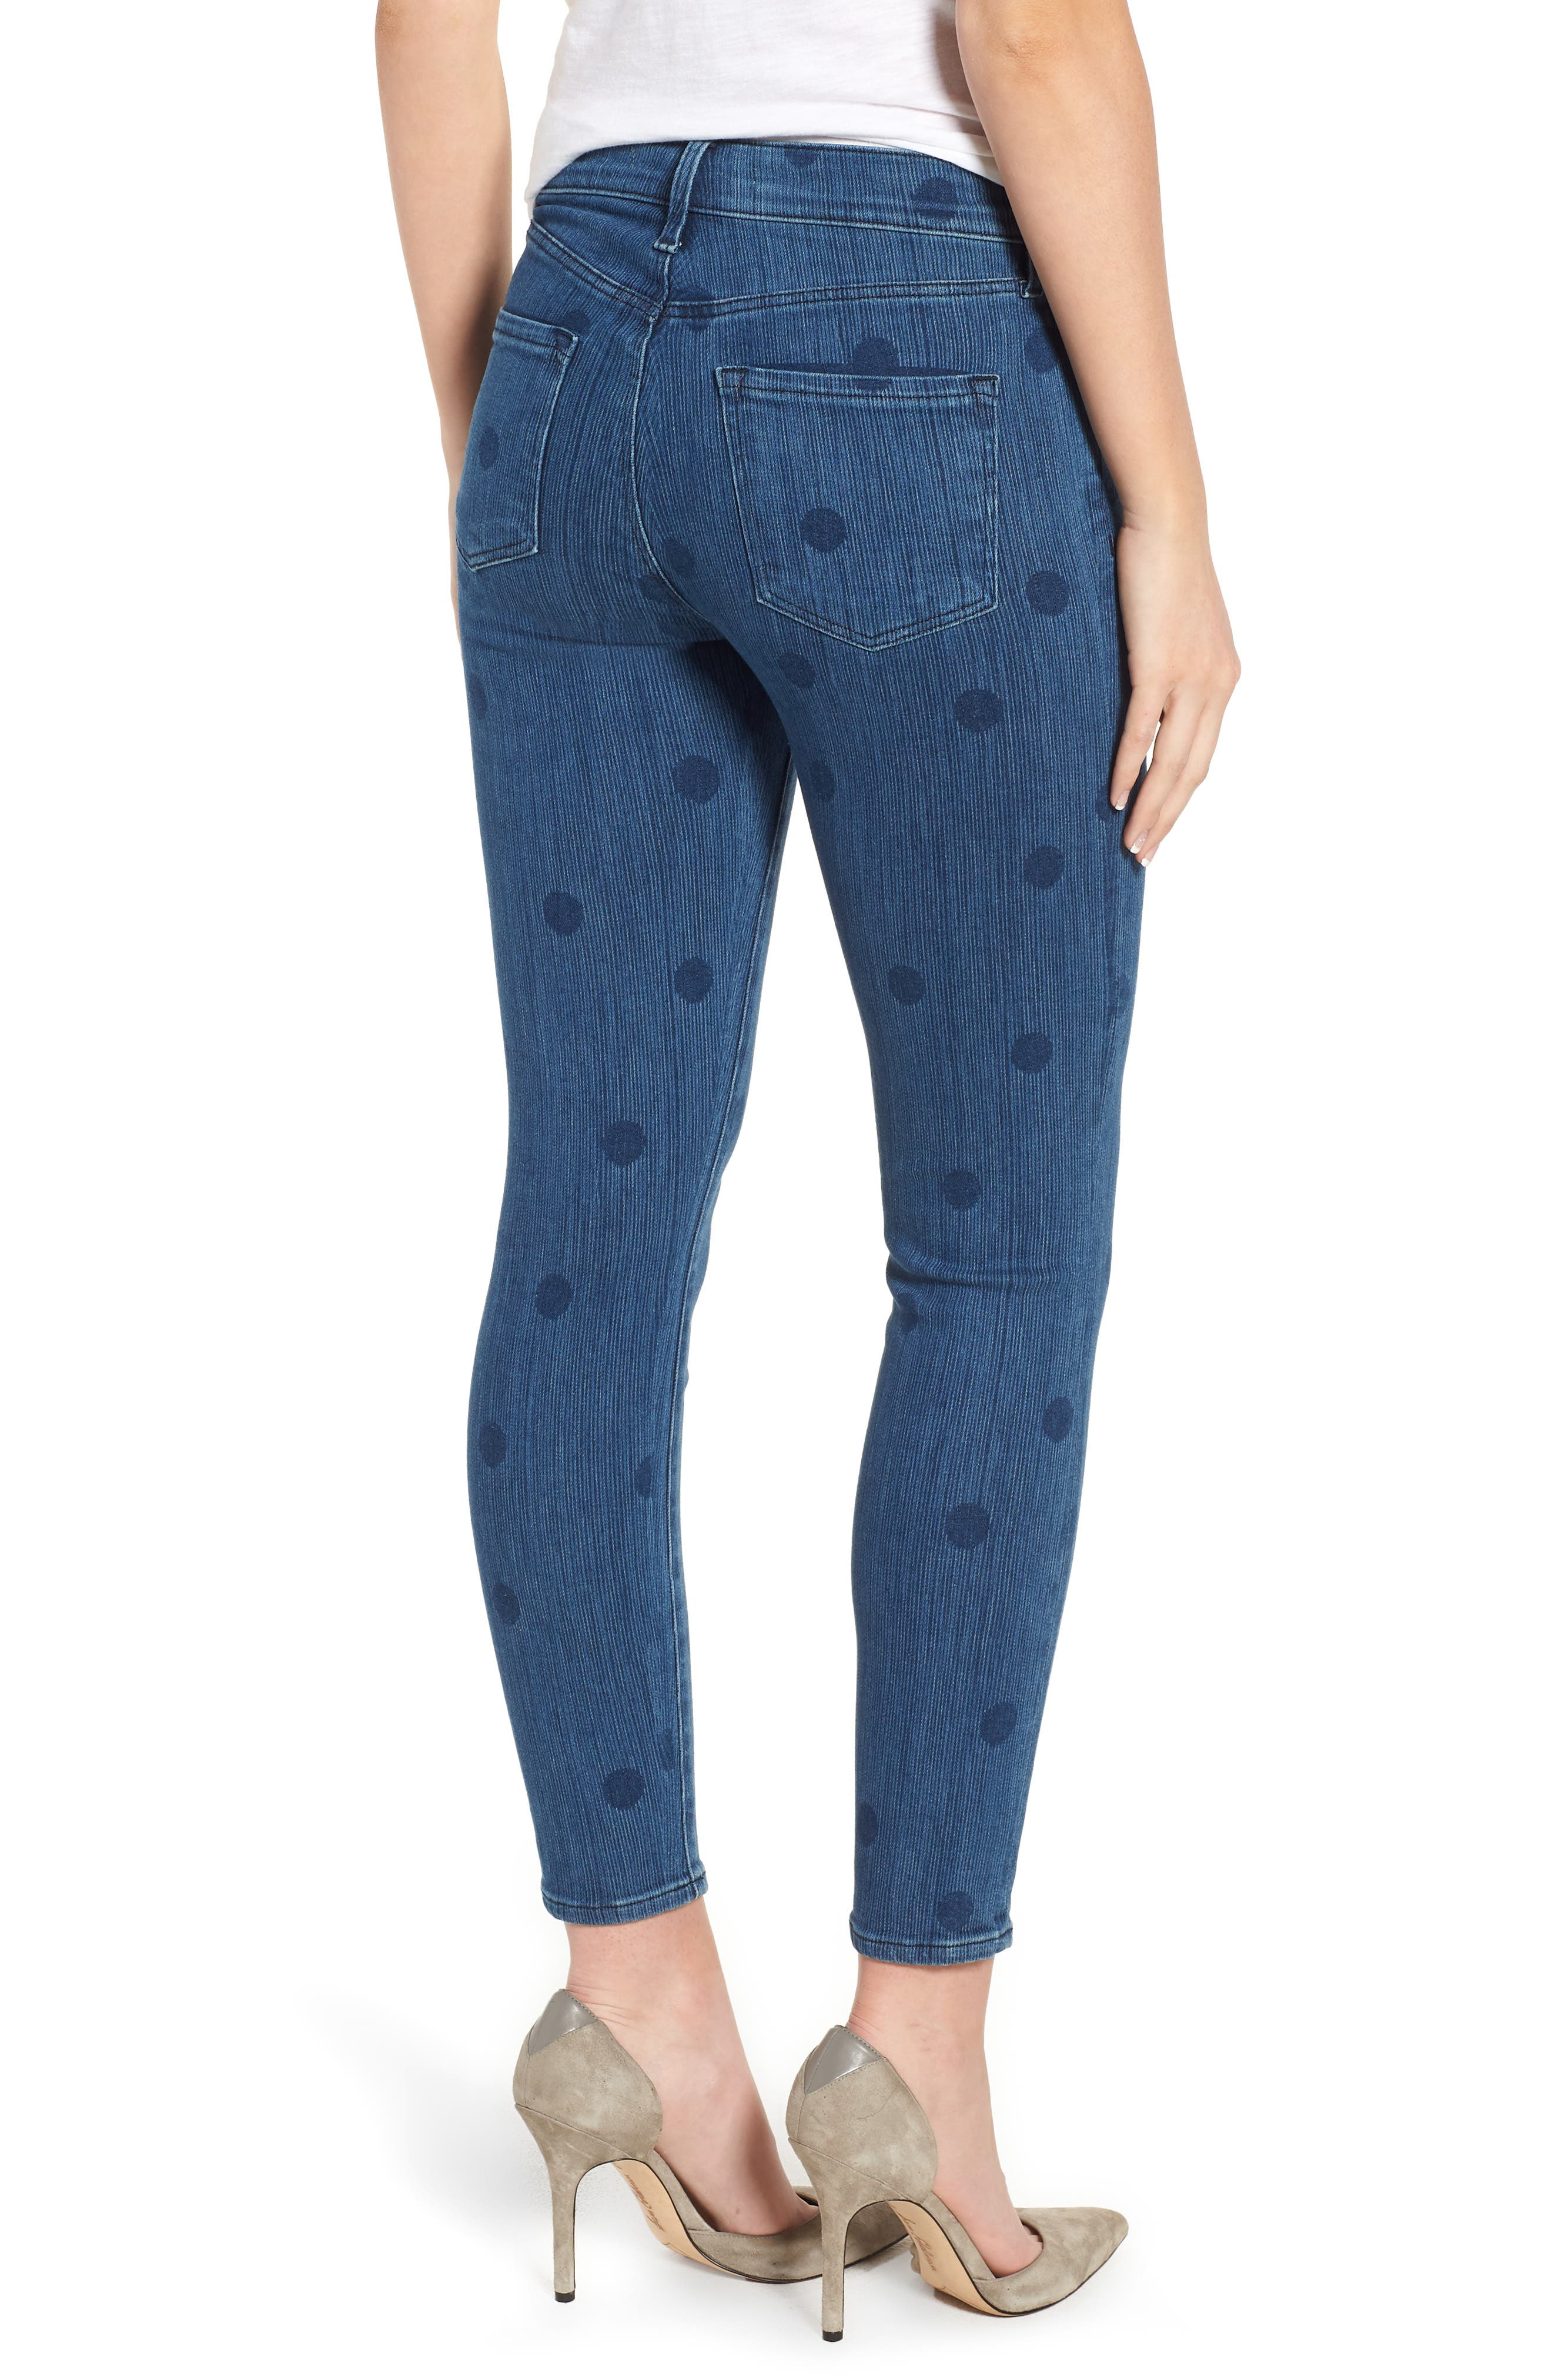 835 Capri Skinny Jeans,                             Alternate thumbnail 2, color,                             Aerial